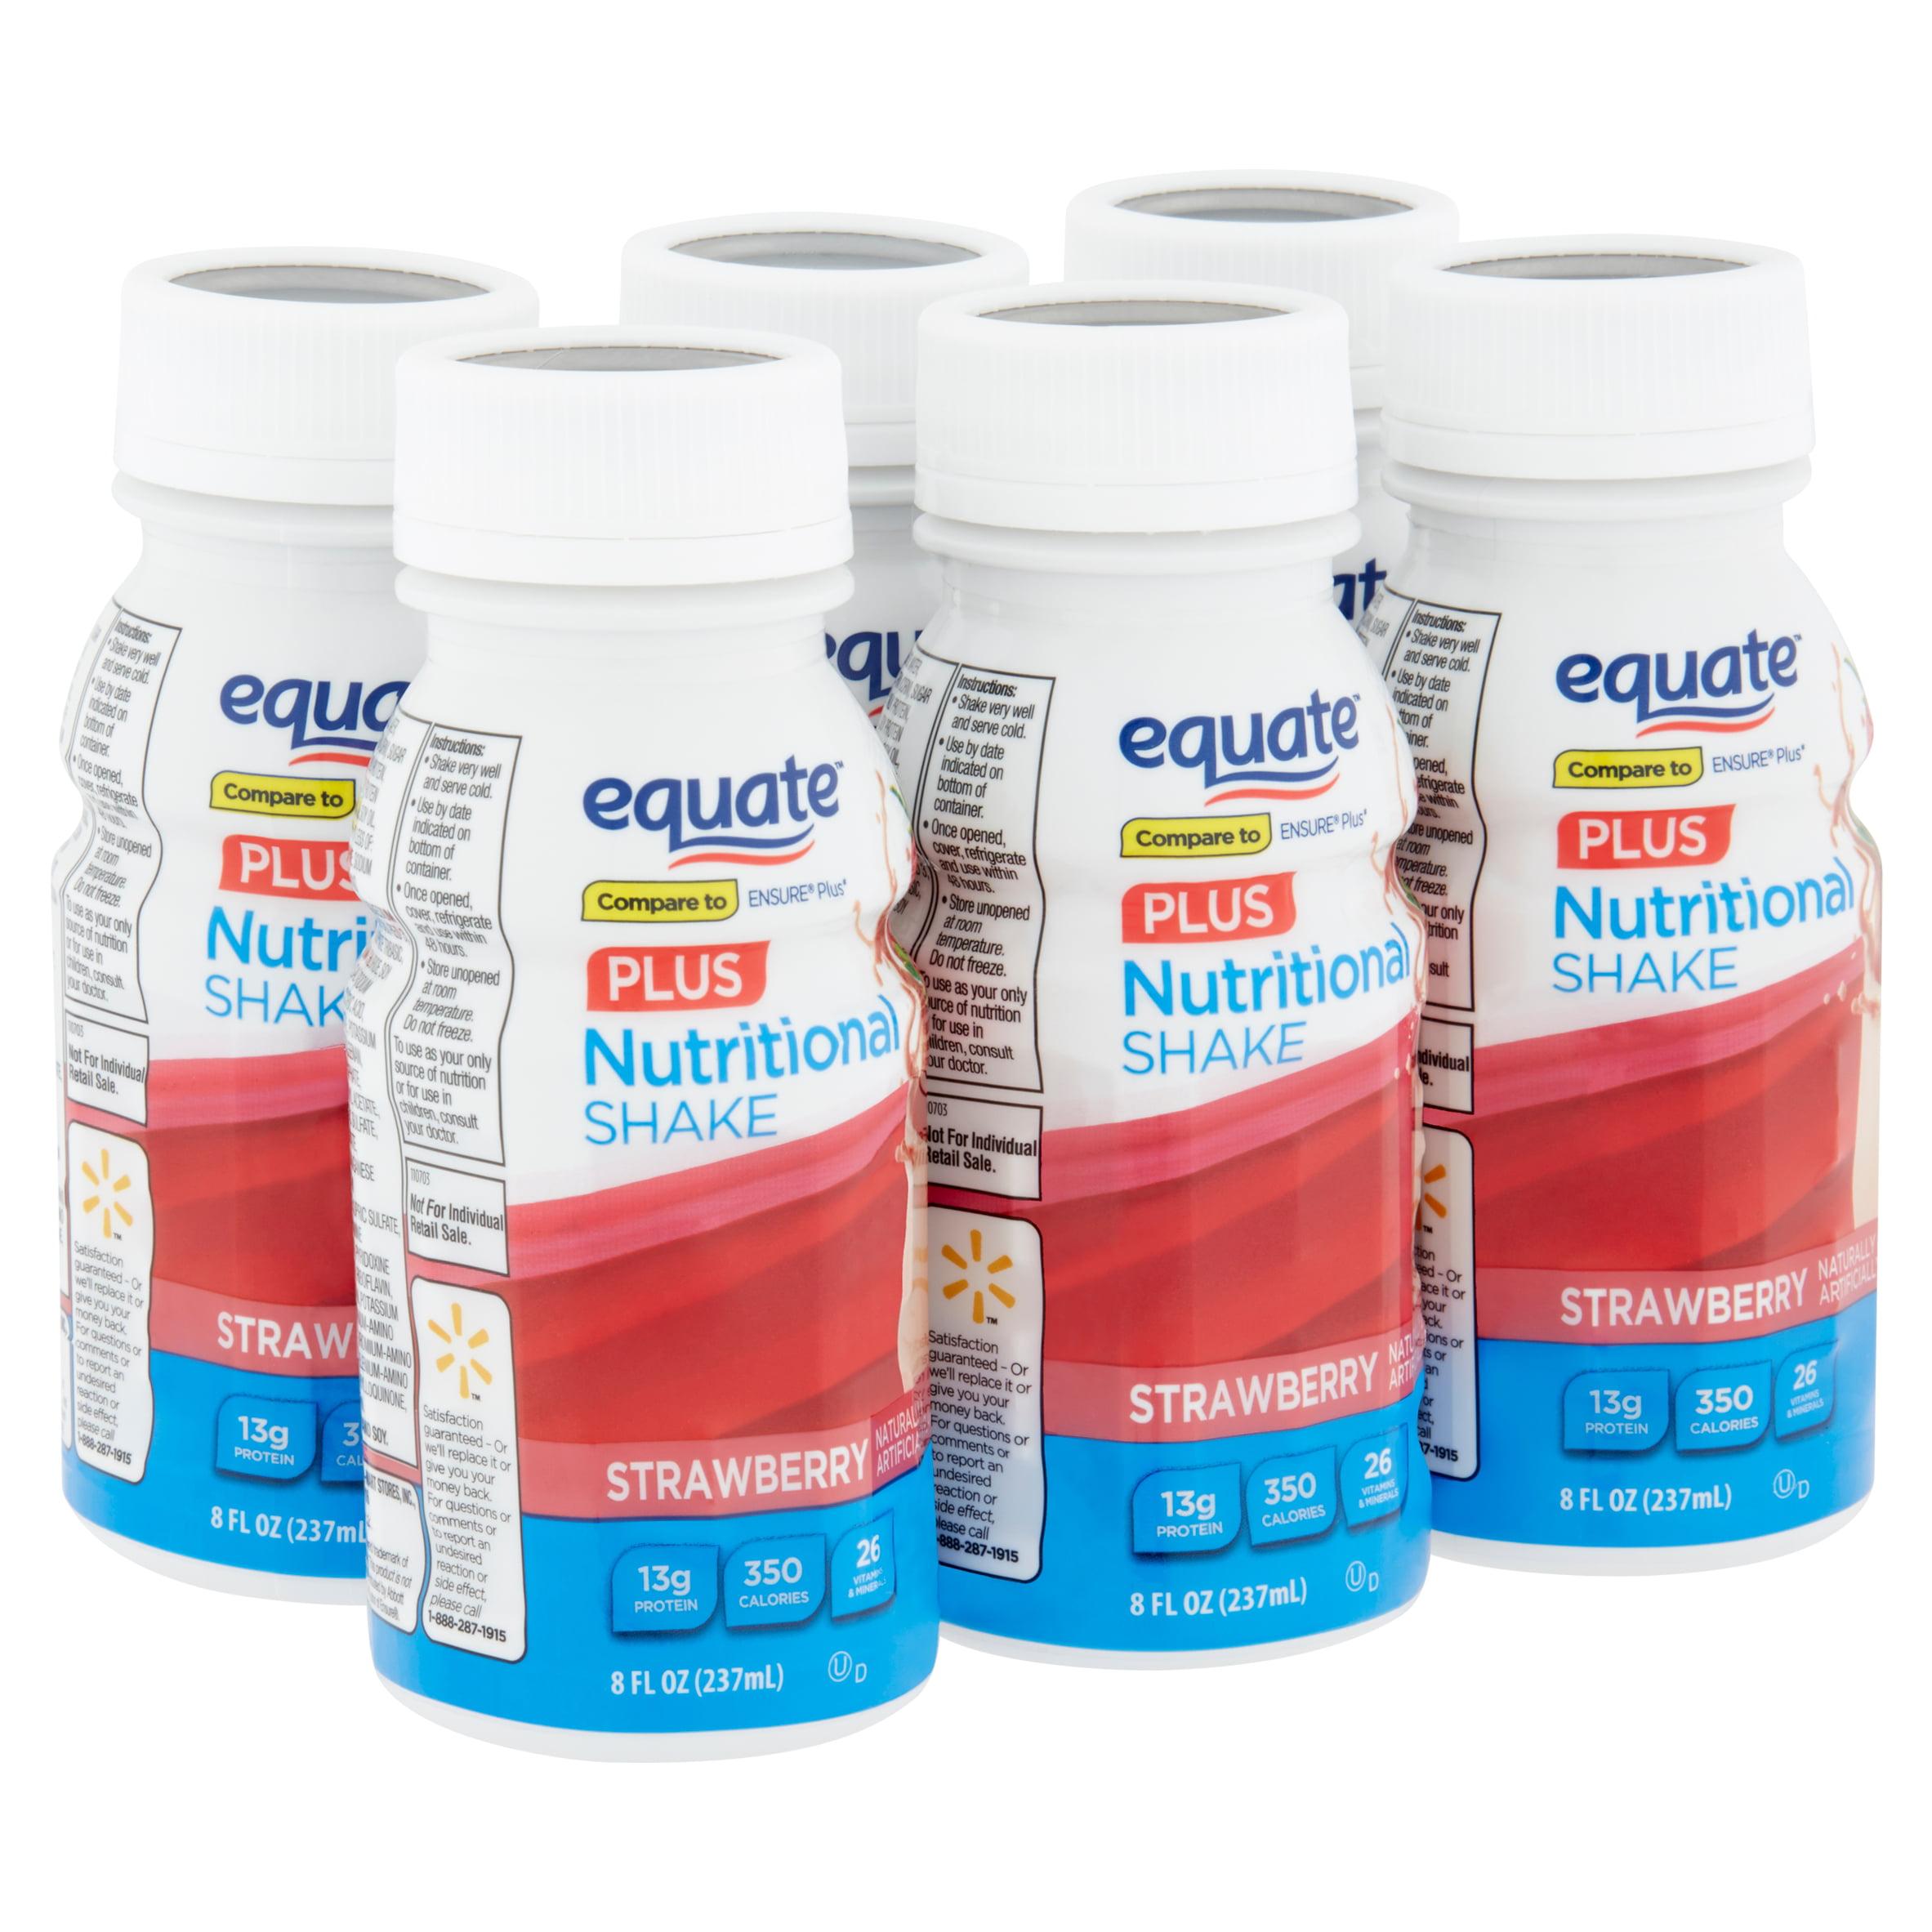 Equate Plus Strawberry Nutritional Shake, 8 fl oz, 6 count